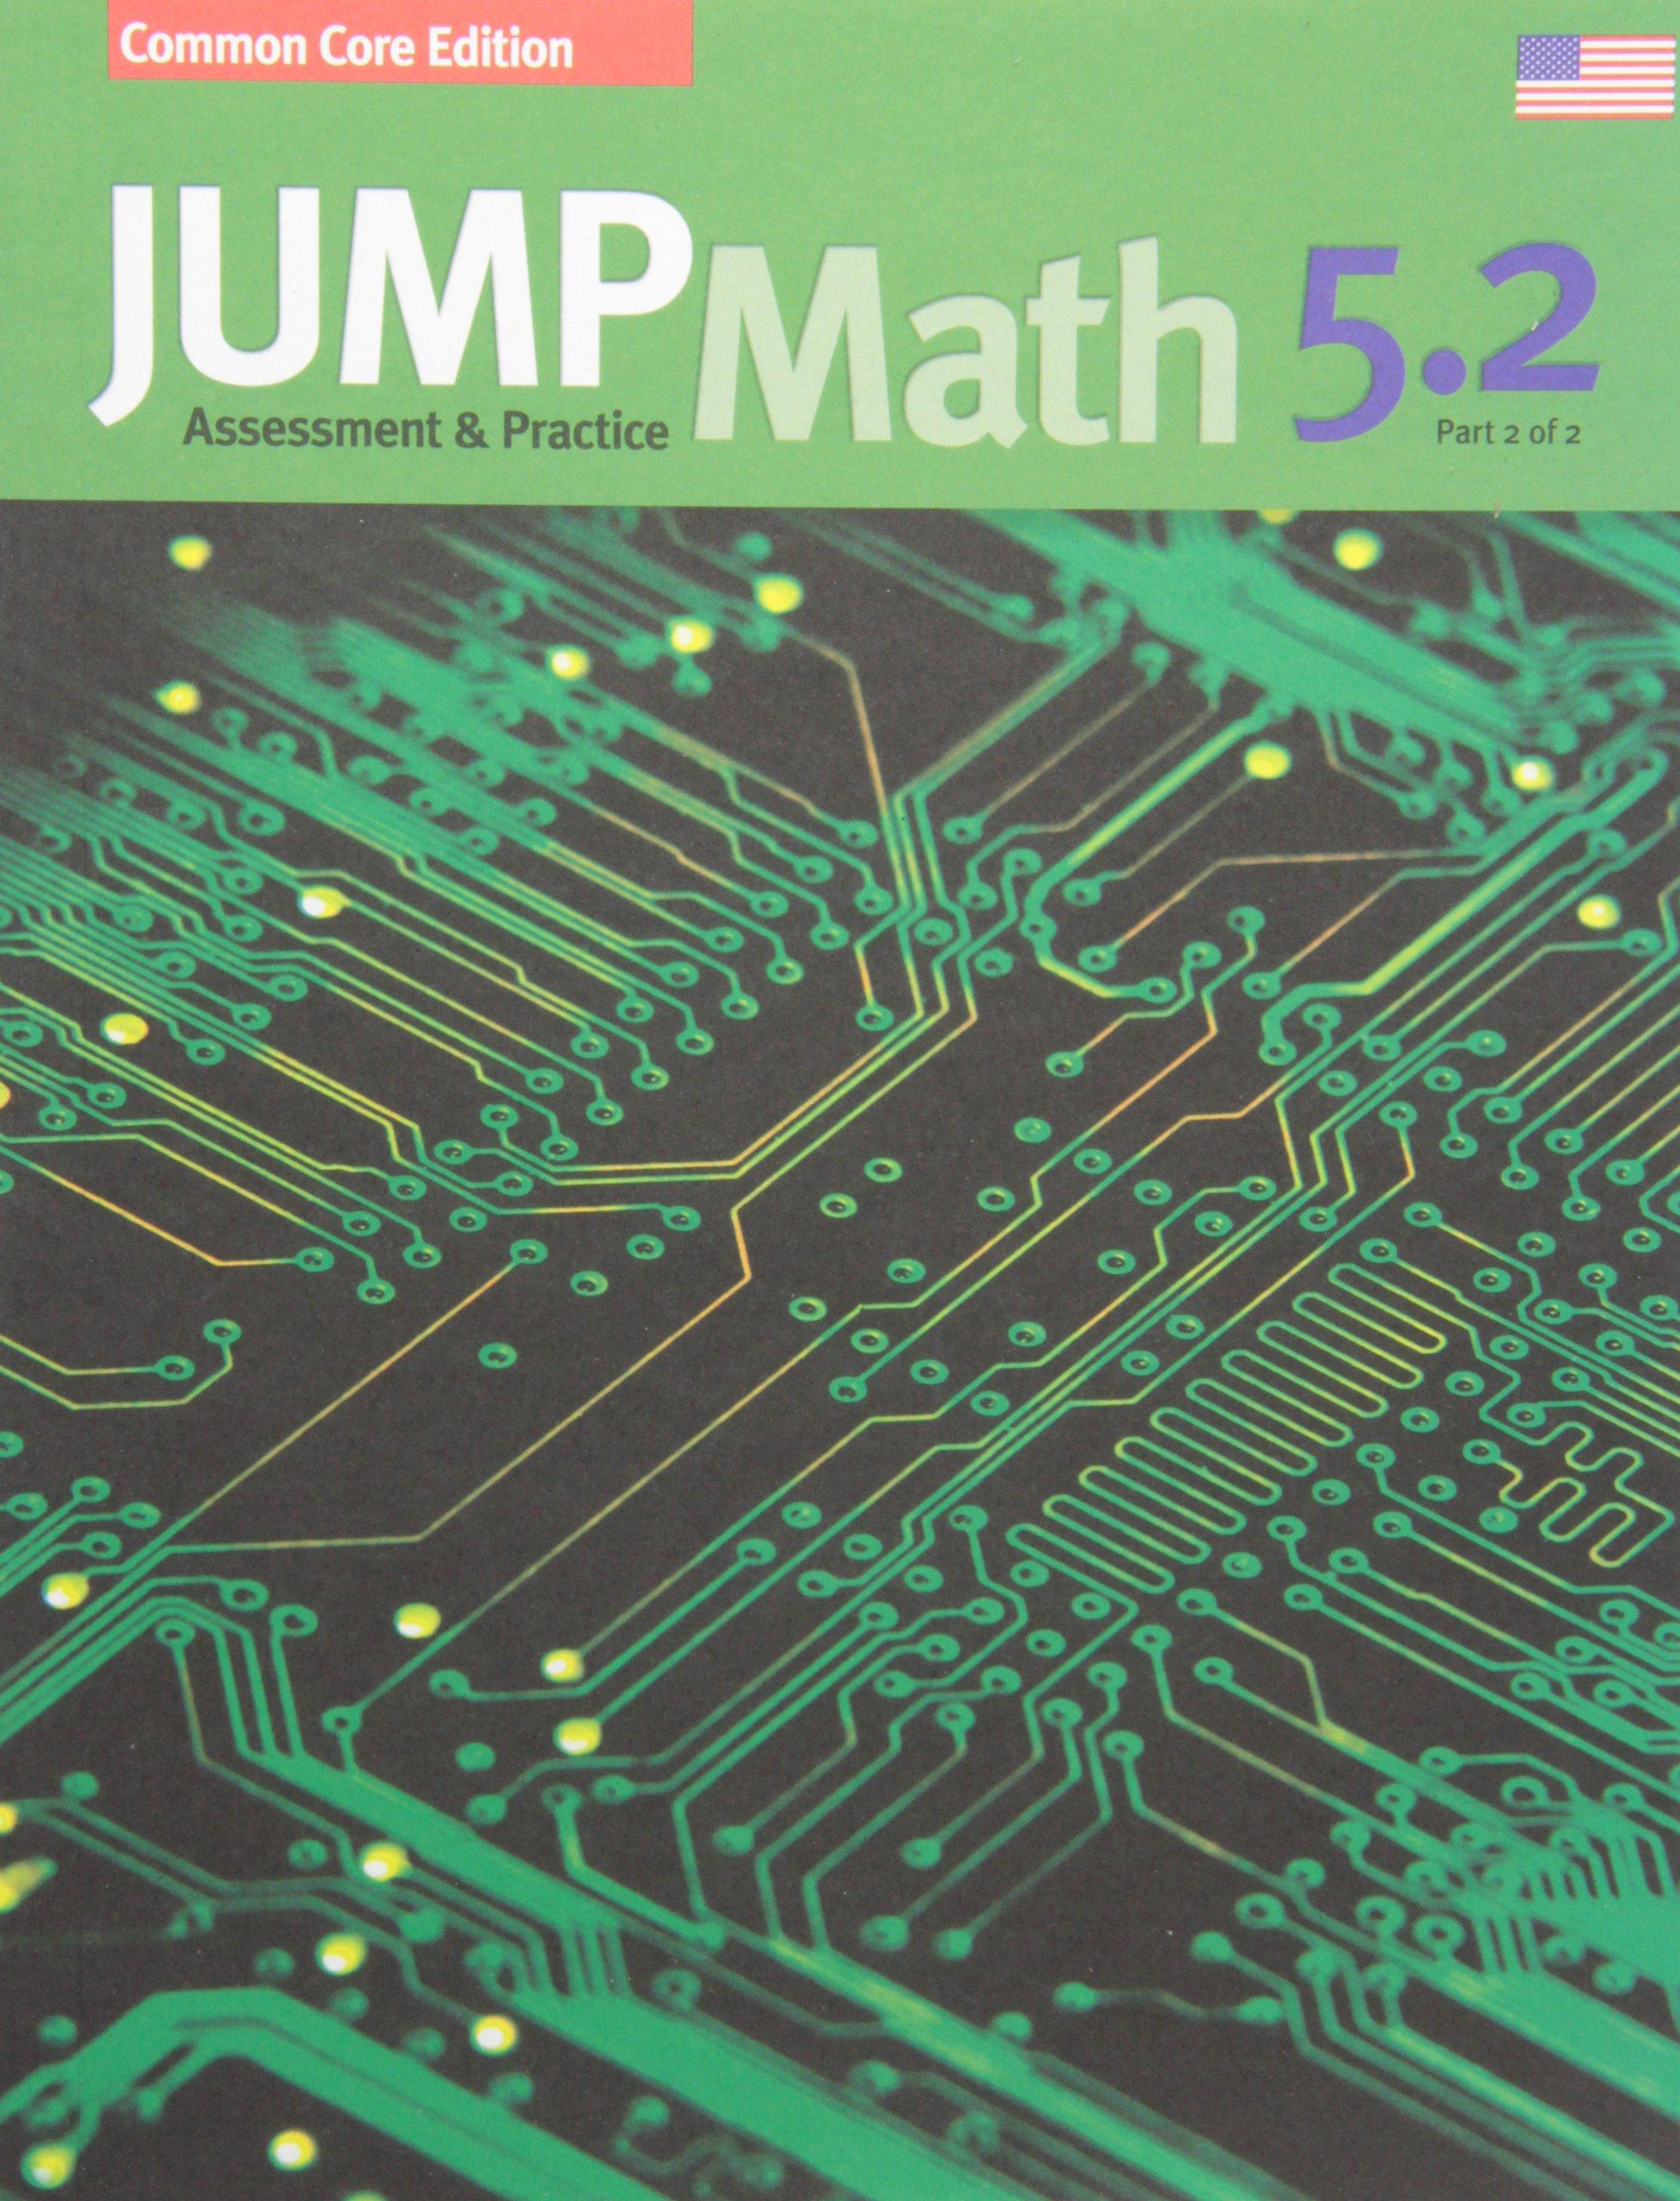 JUMP Math AP Book 5.2: US Common Core Edition ebook